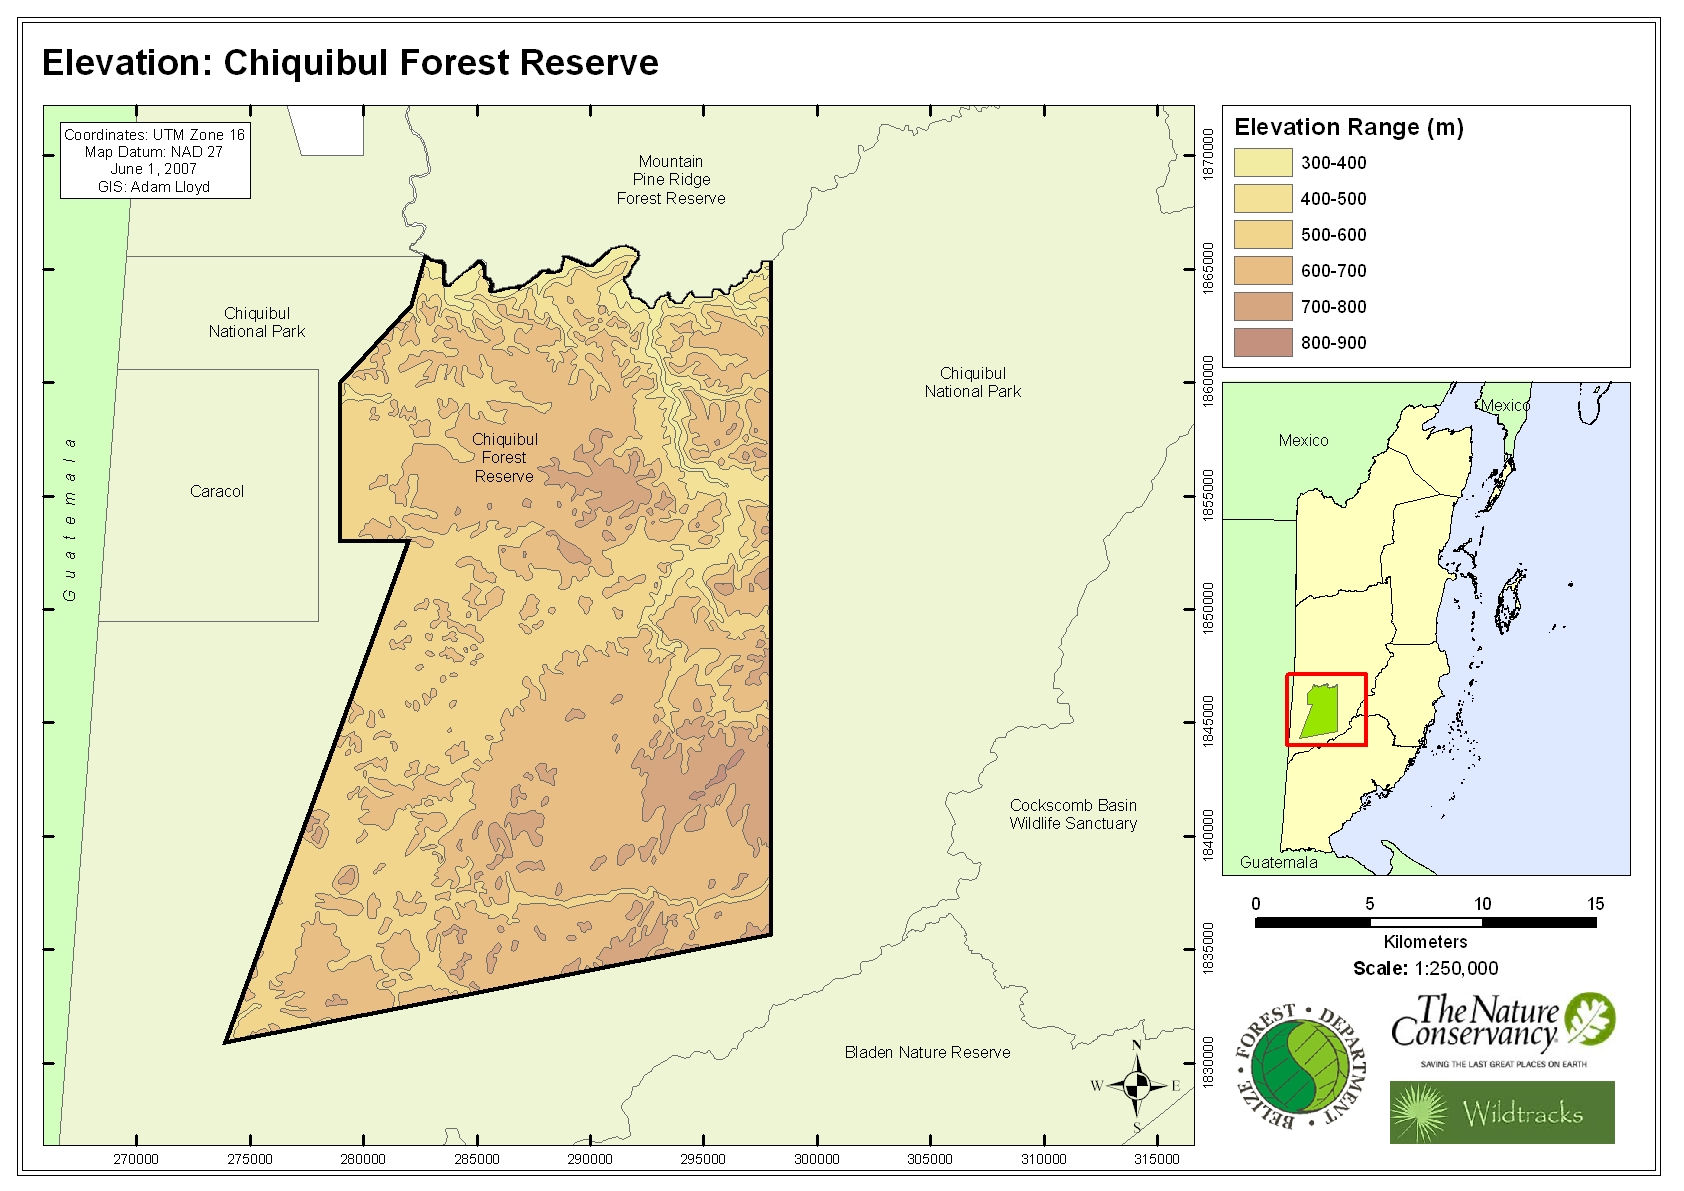 Elevation: Chiquibul Forest Reserve